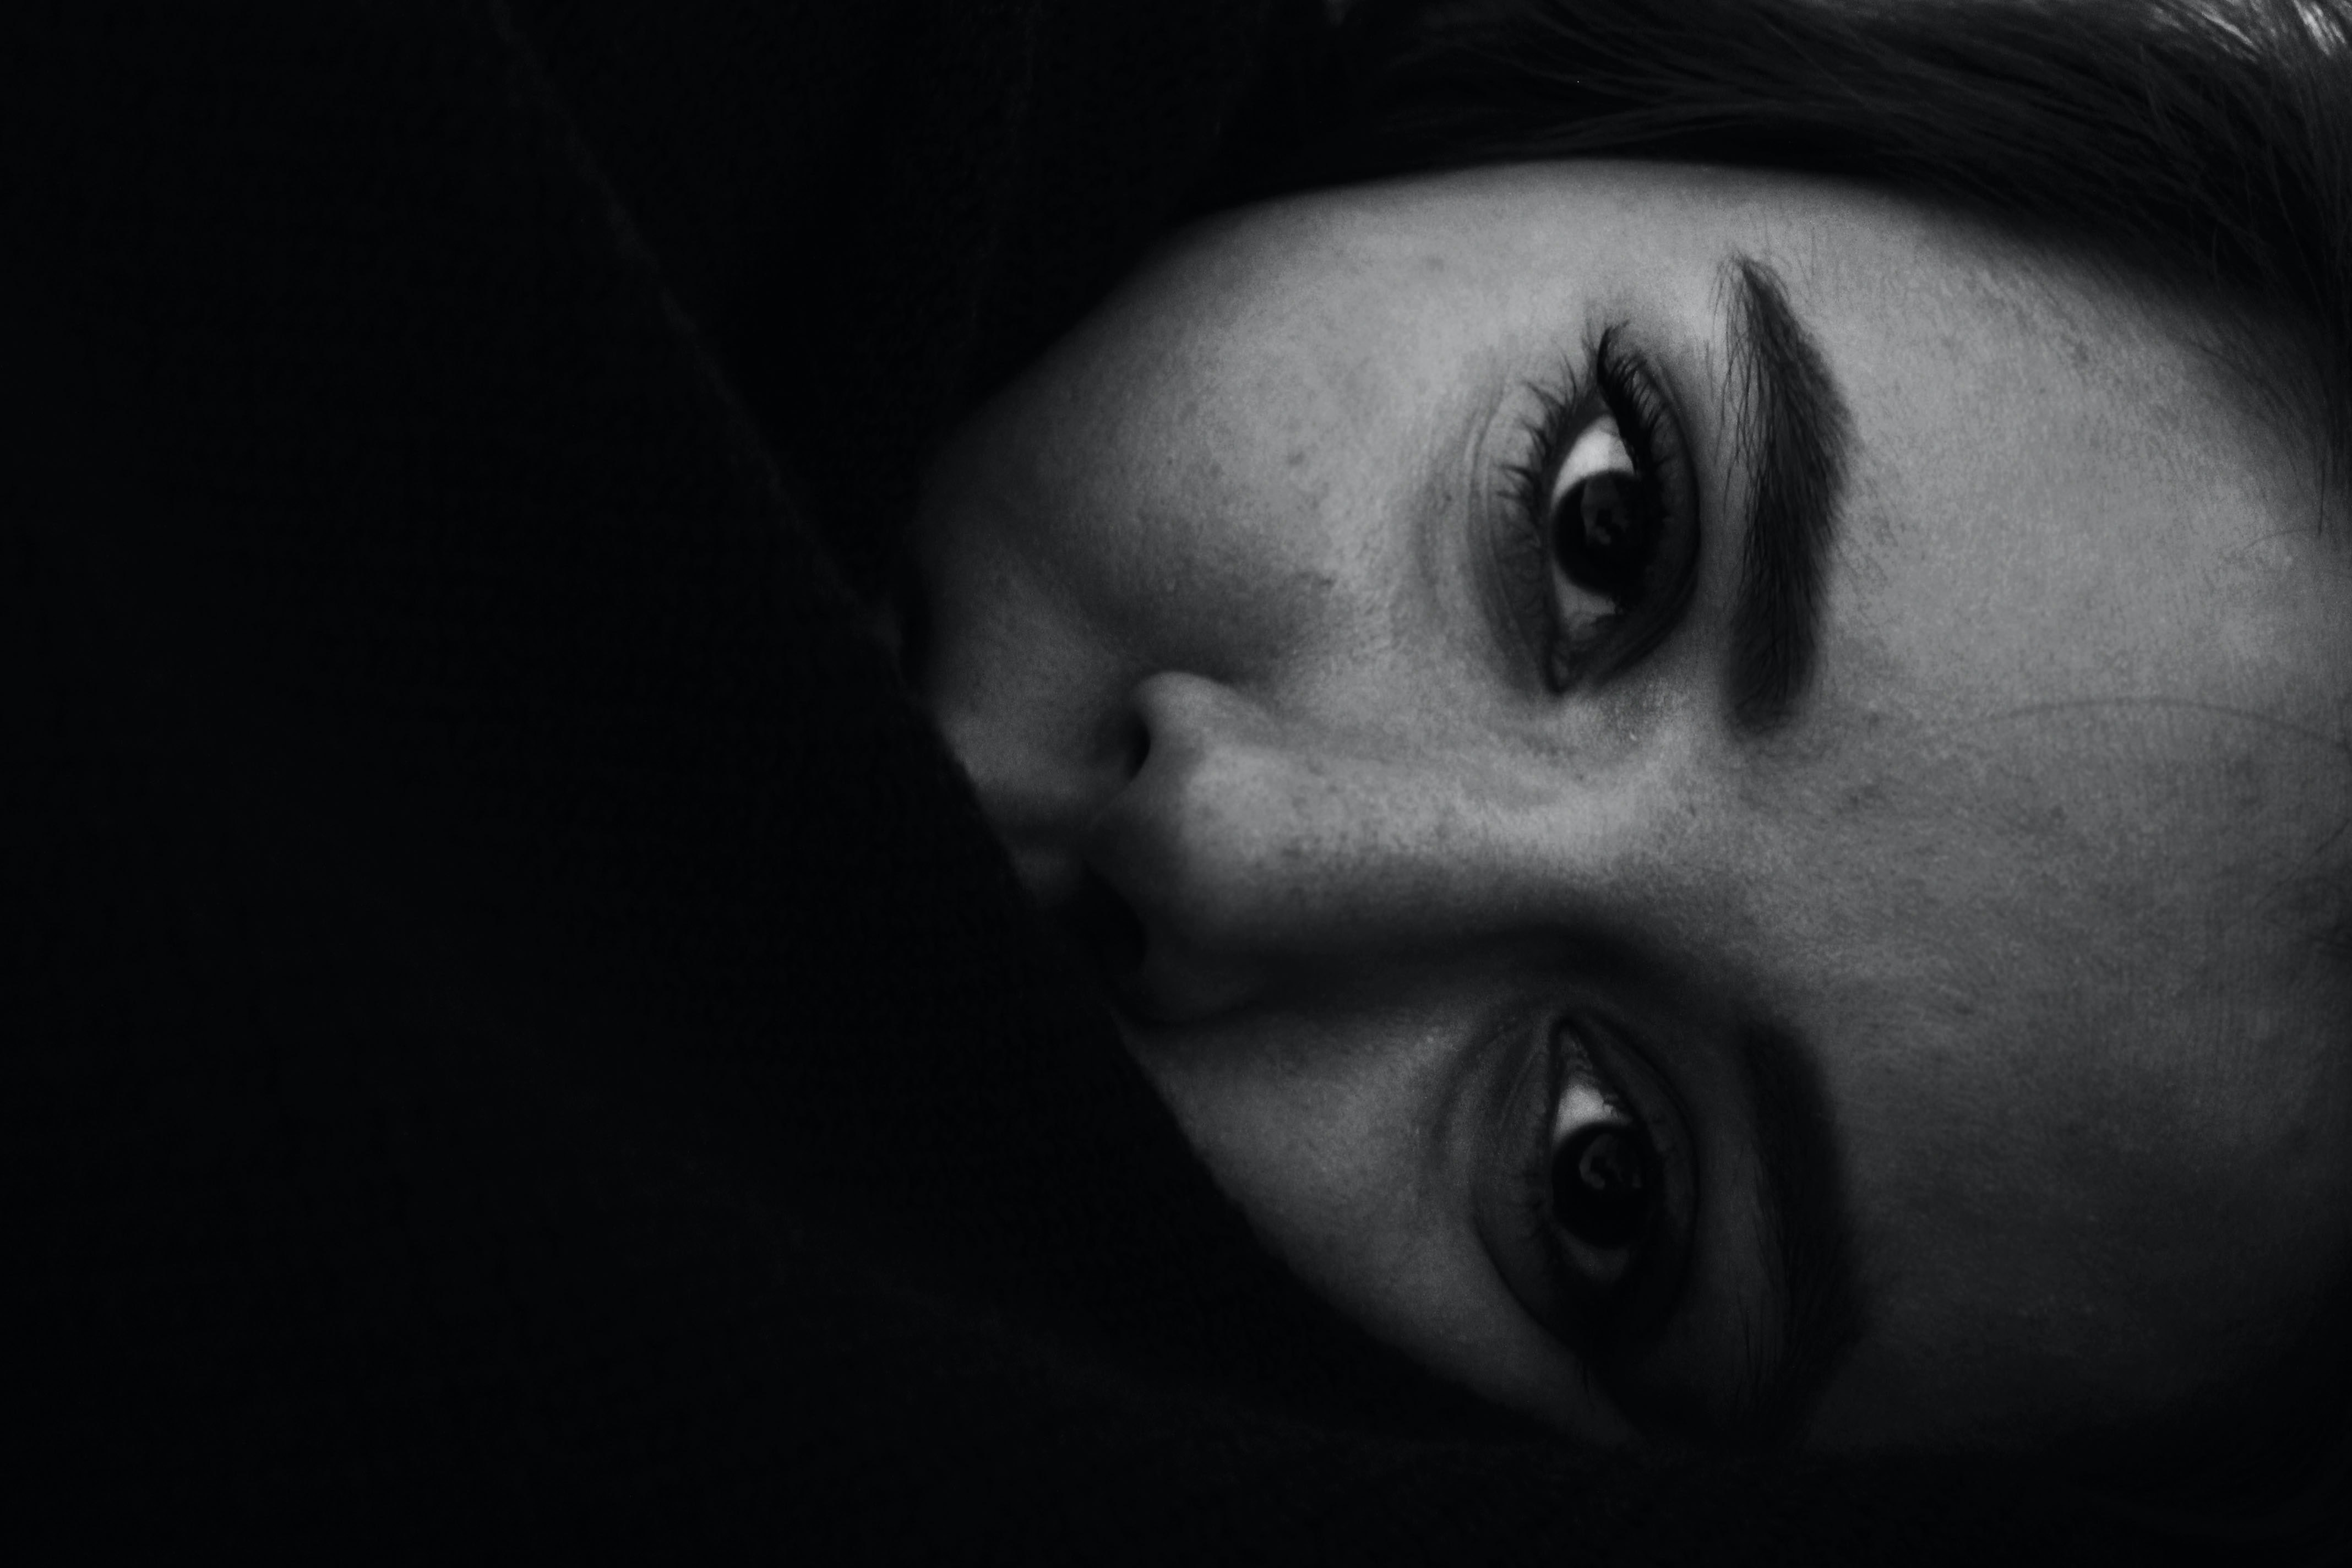 A problem within myself illness stories